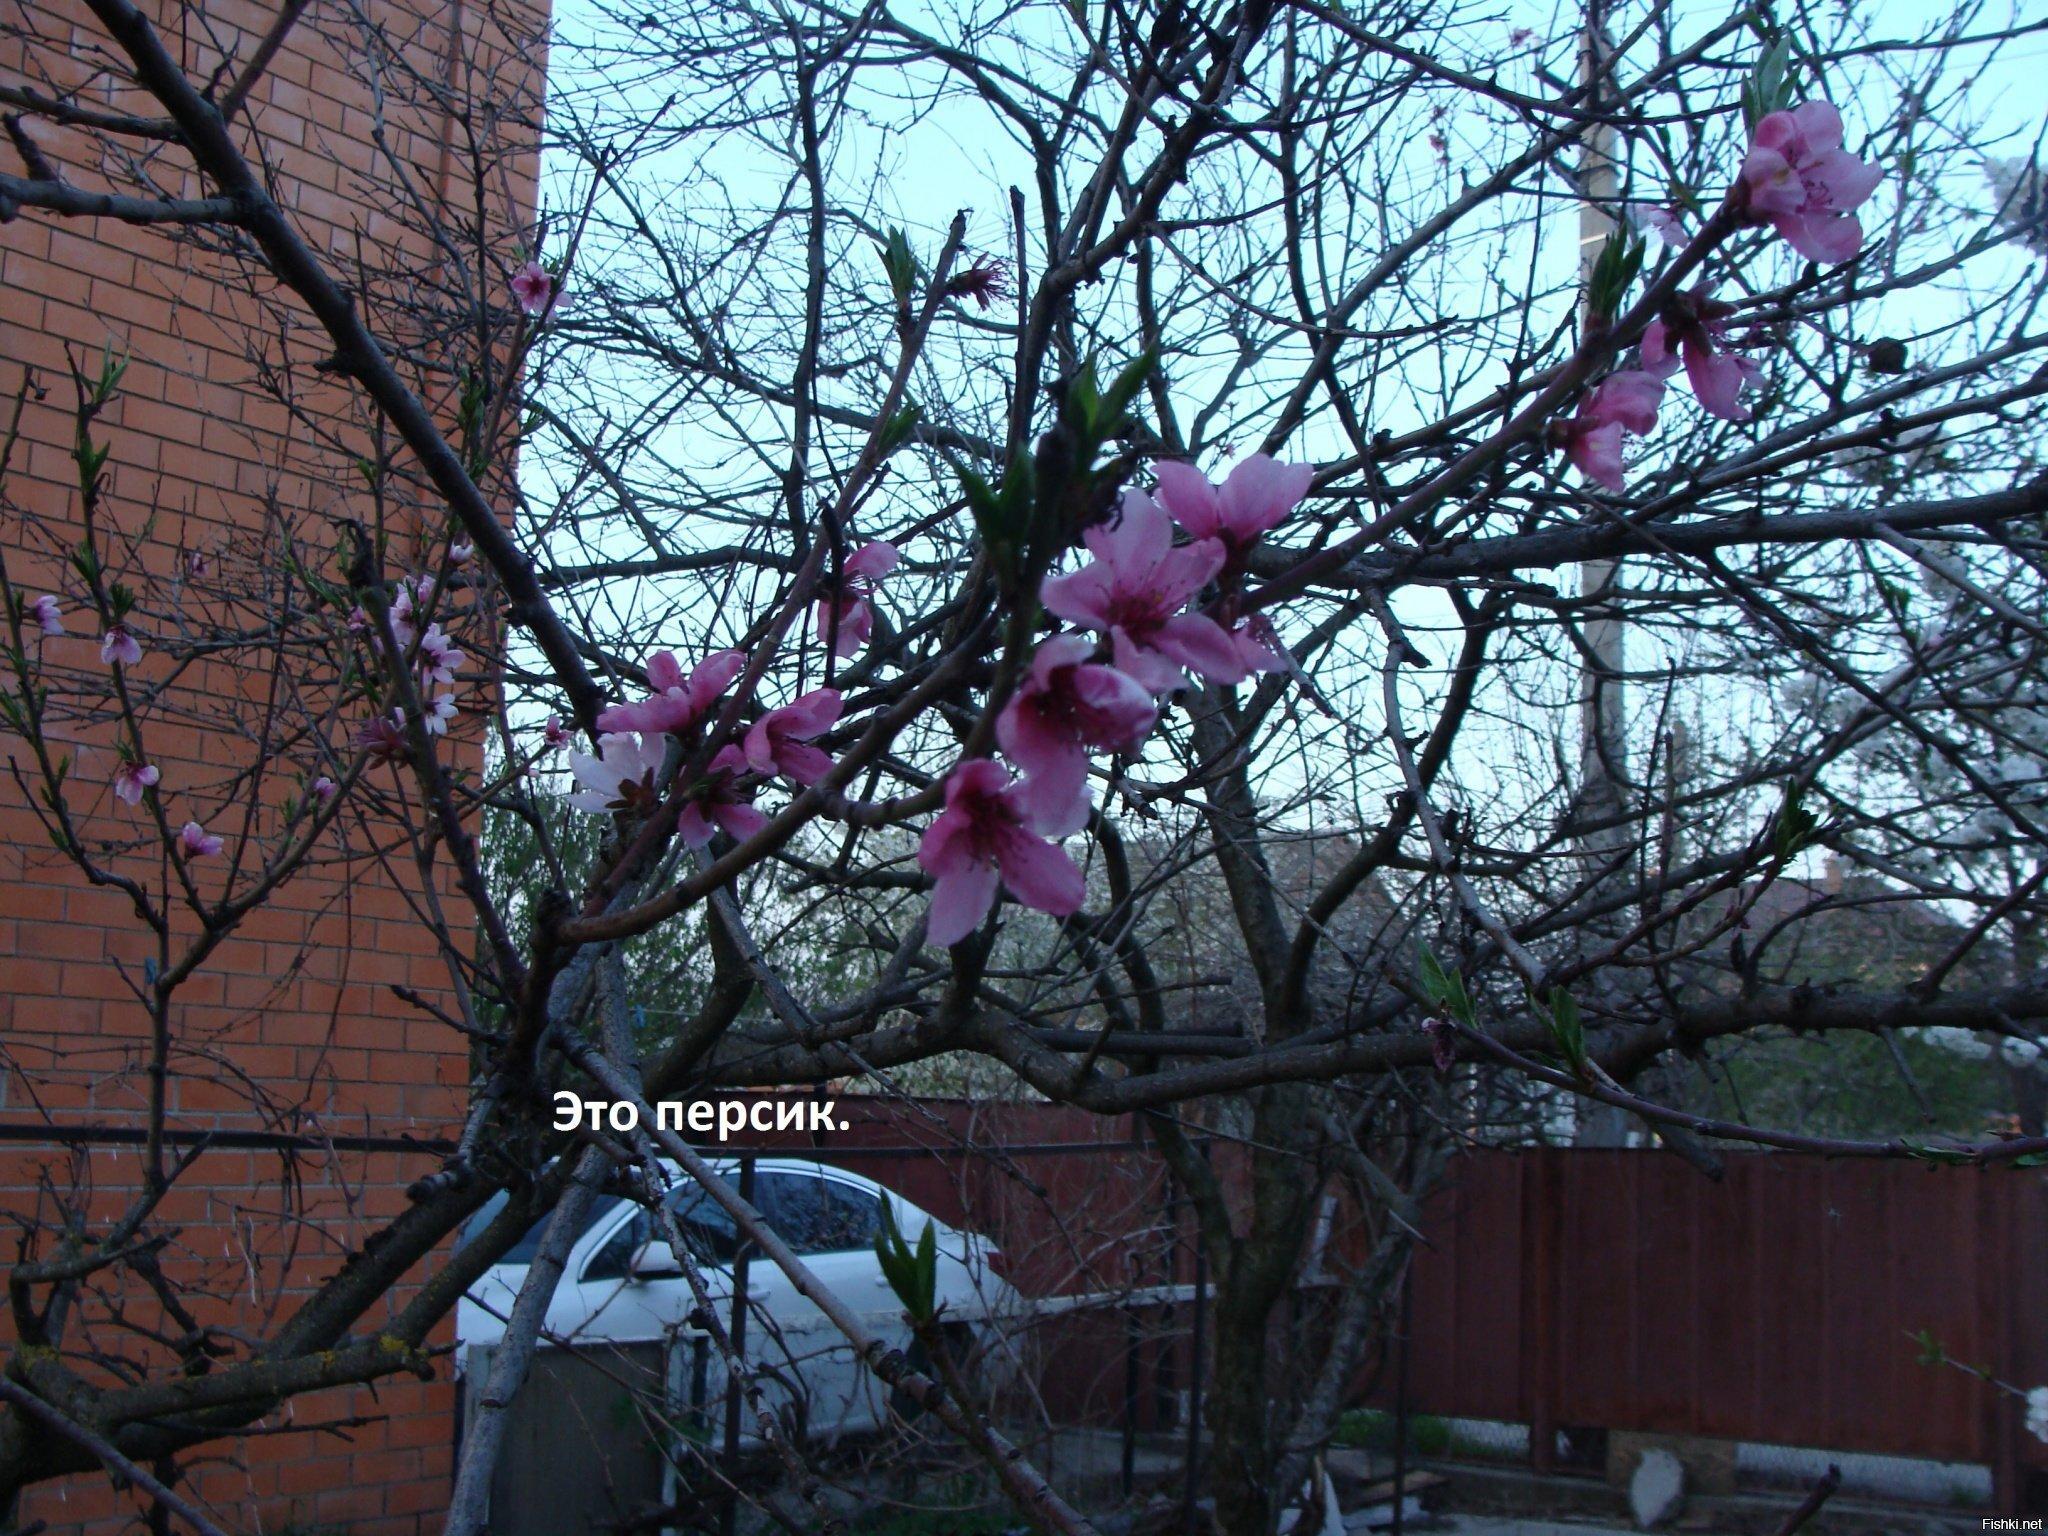 В Краснодаре отцвели абрикосы и зацвели черешни, персики, сливы